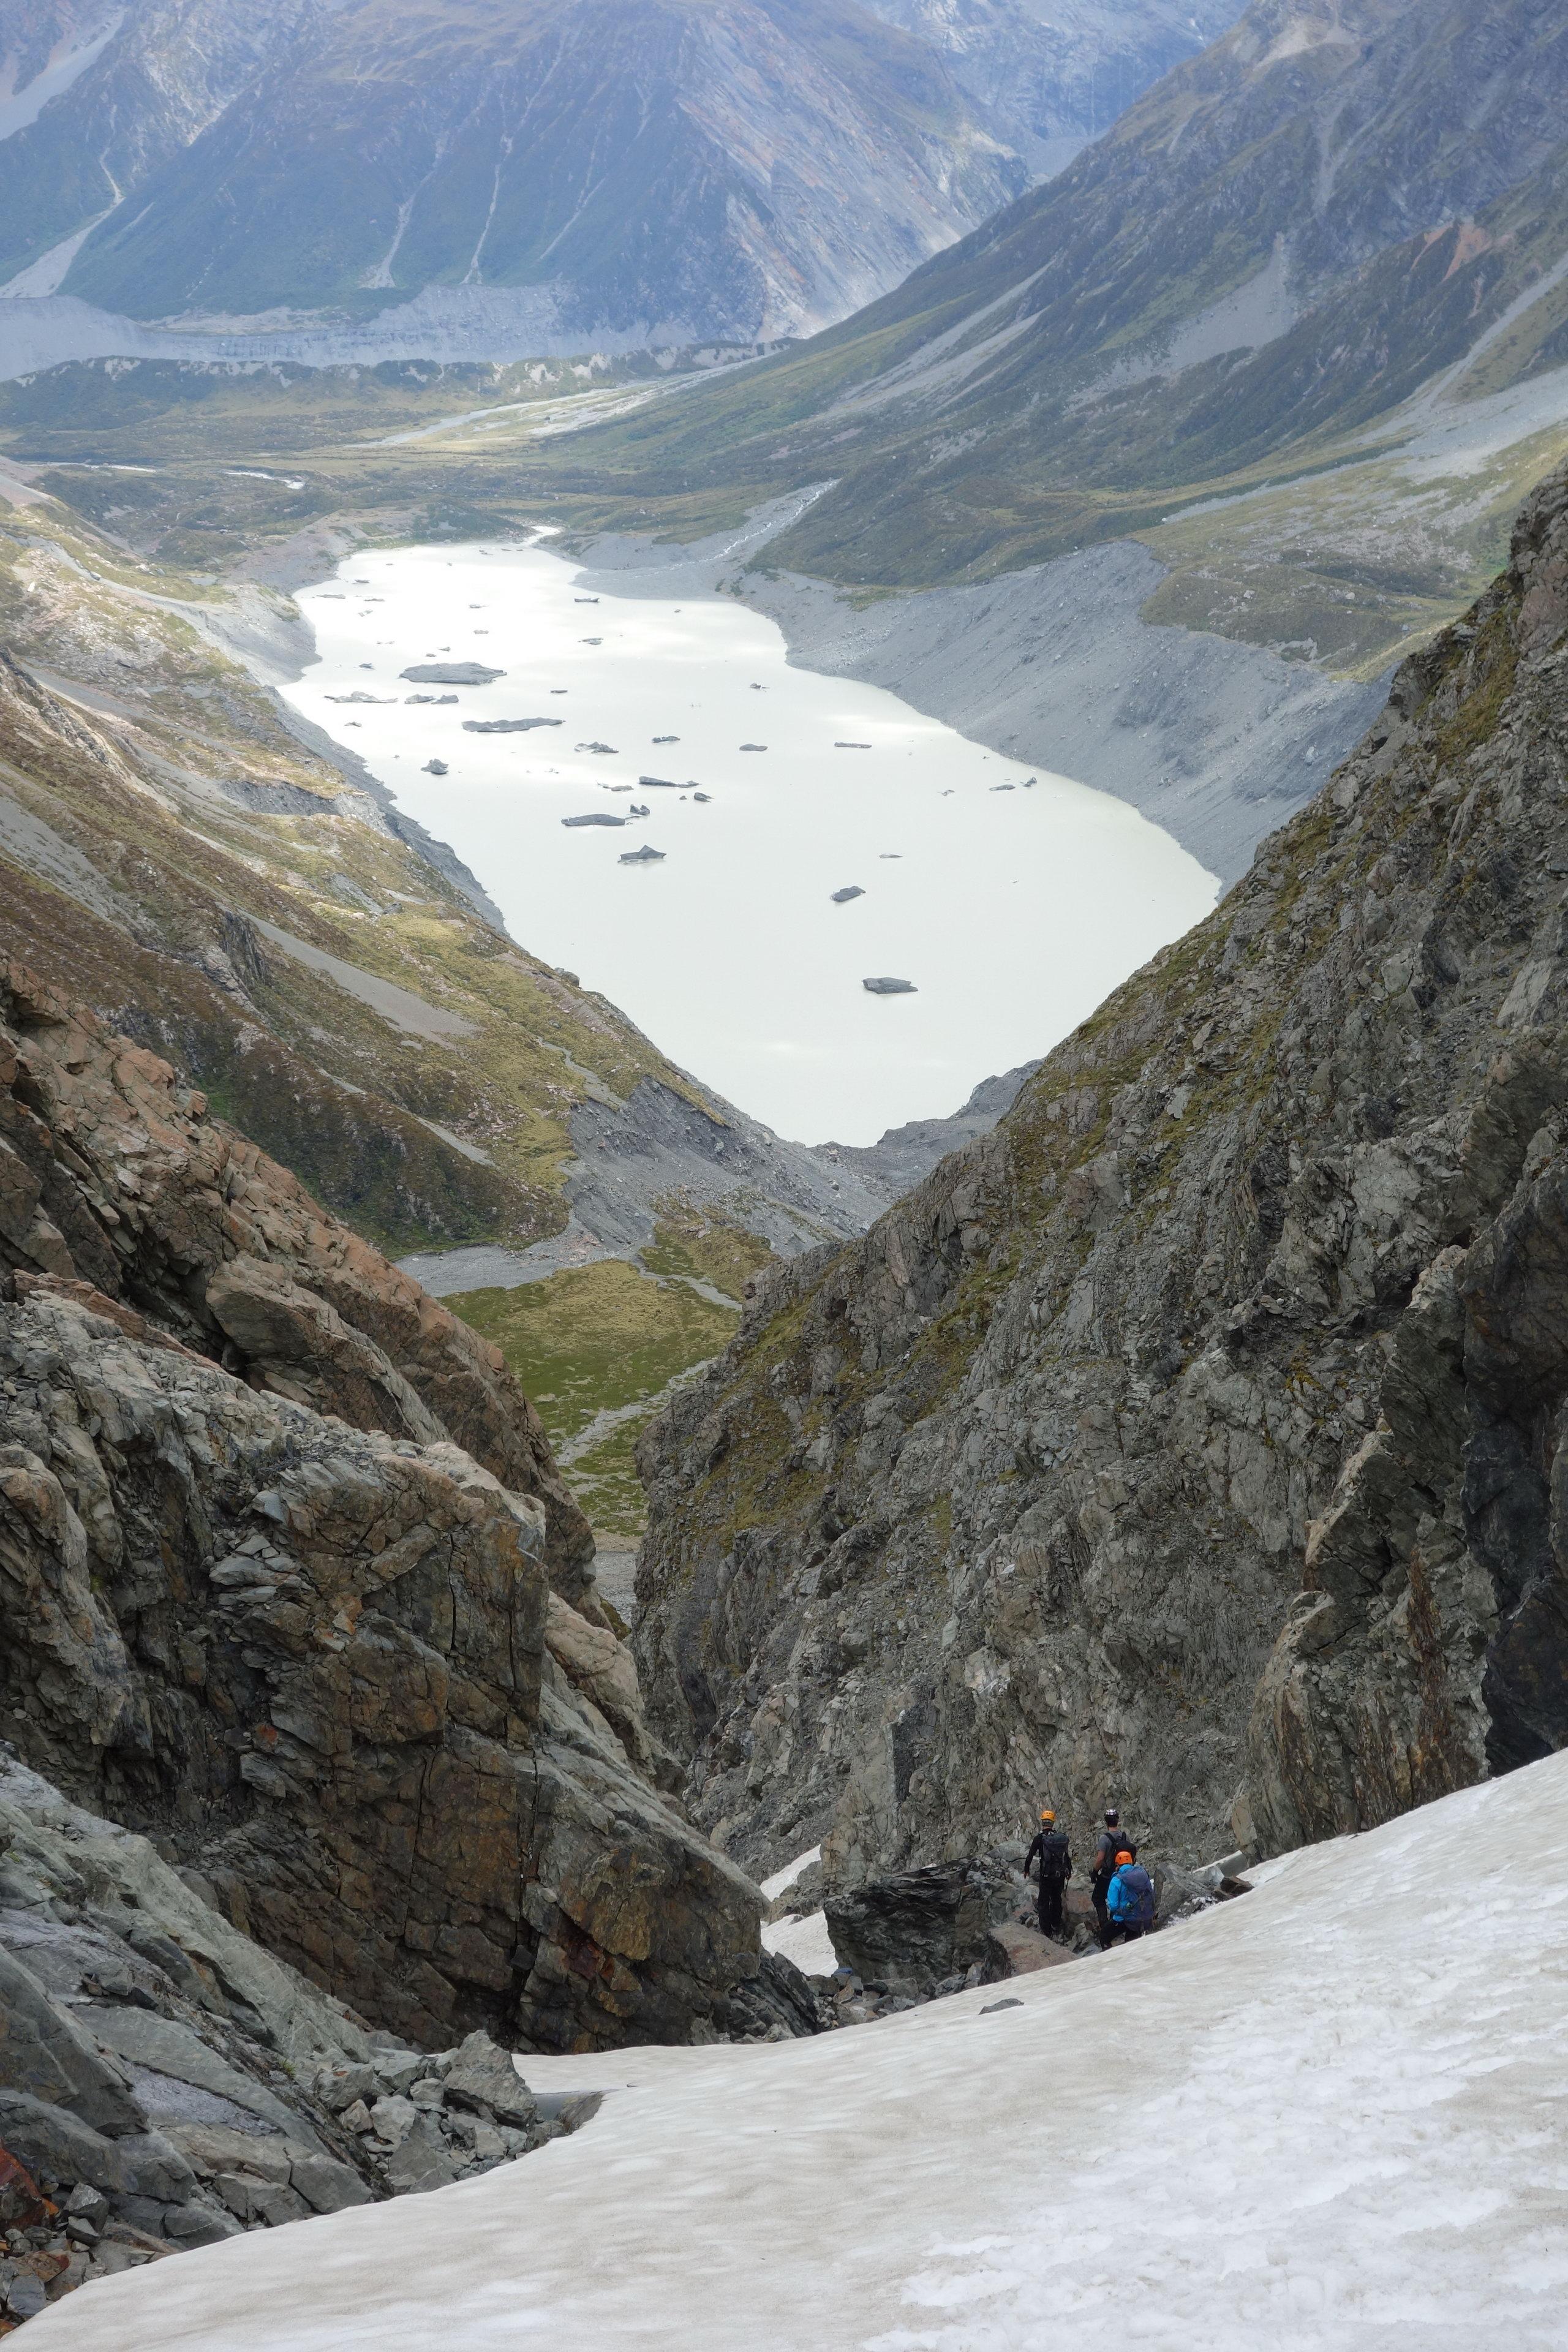 Descending towards the Hooker Terminal Lake (Ball Pass Dec 2013)